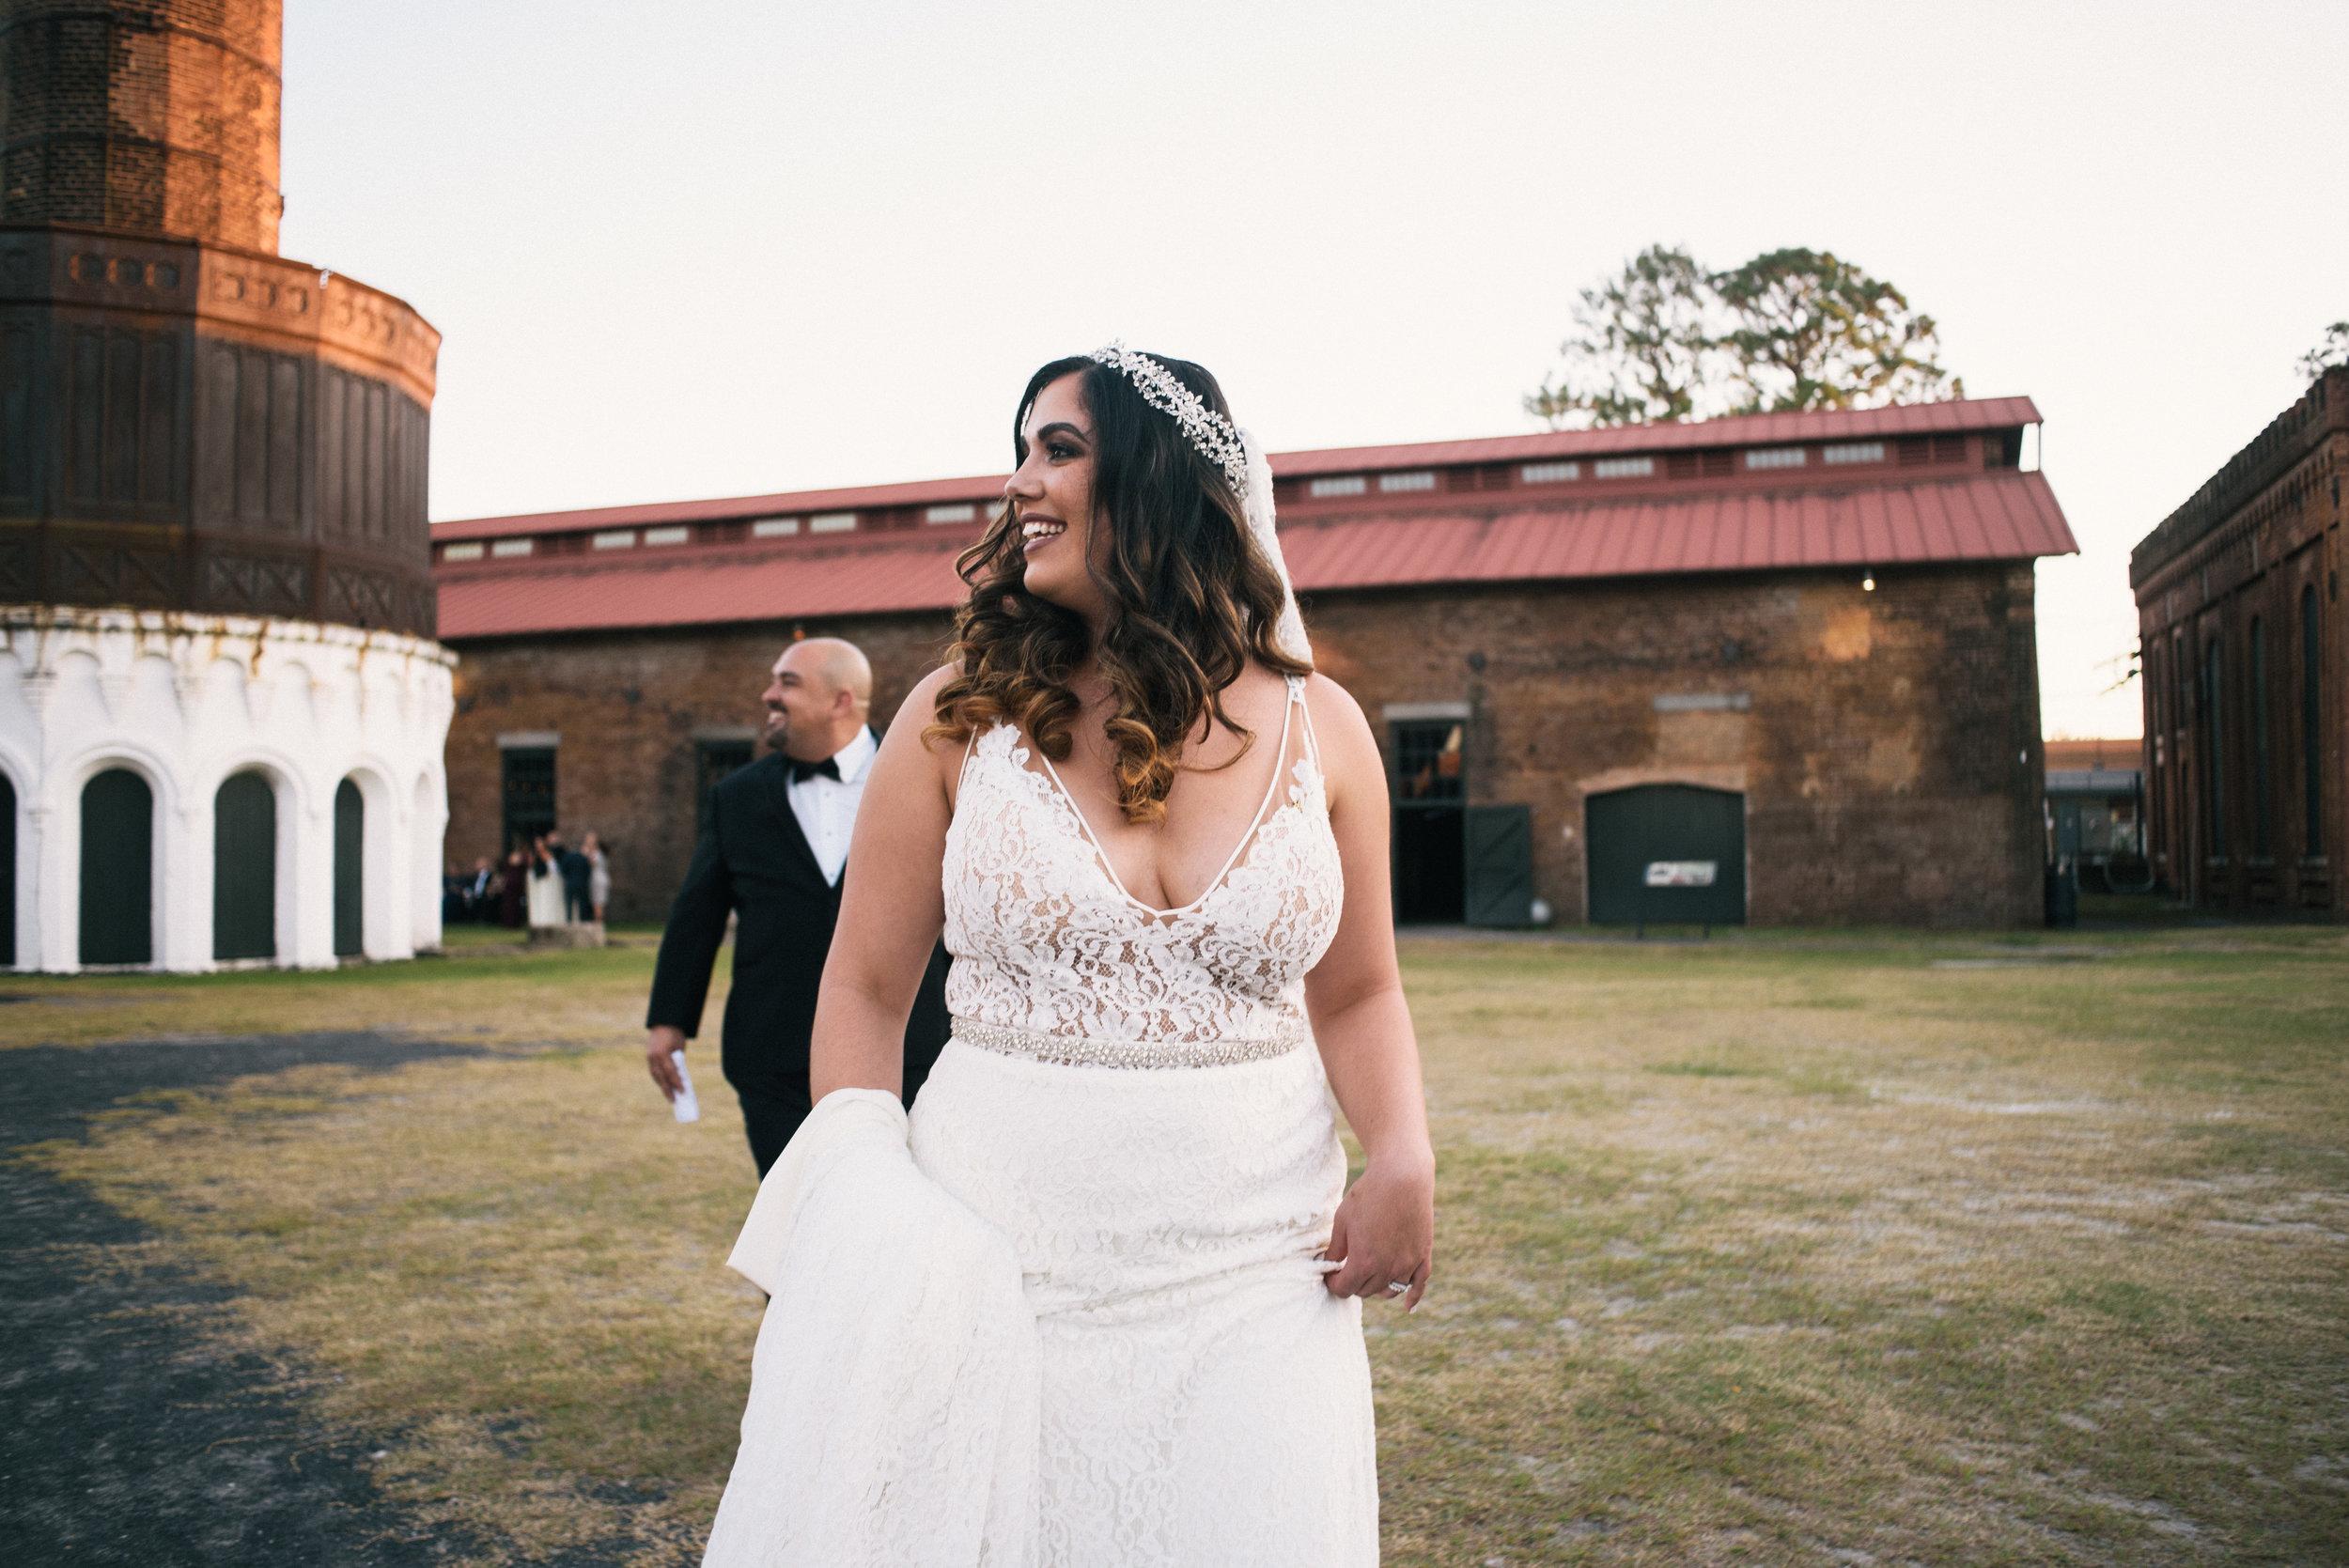 Iggy-and-yesenia-savannah-railroad-museum-wedding-meg-hill-photo- (713 of 1037).jpg